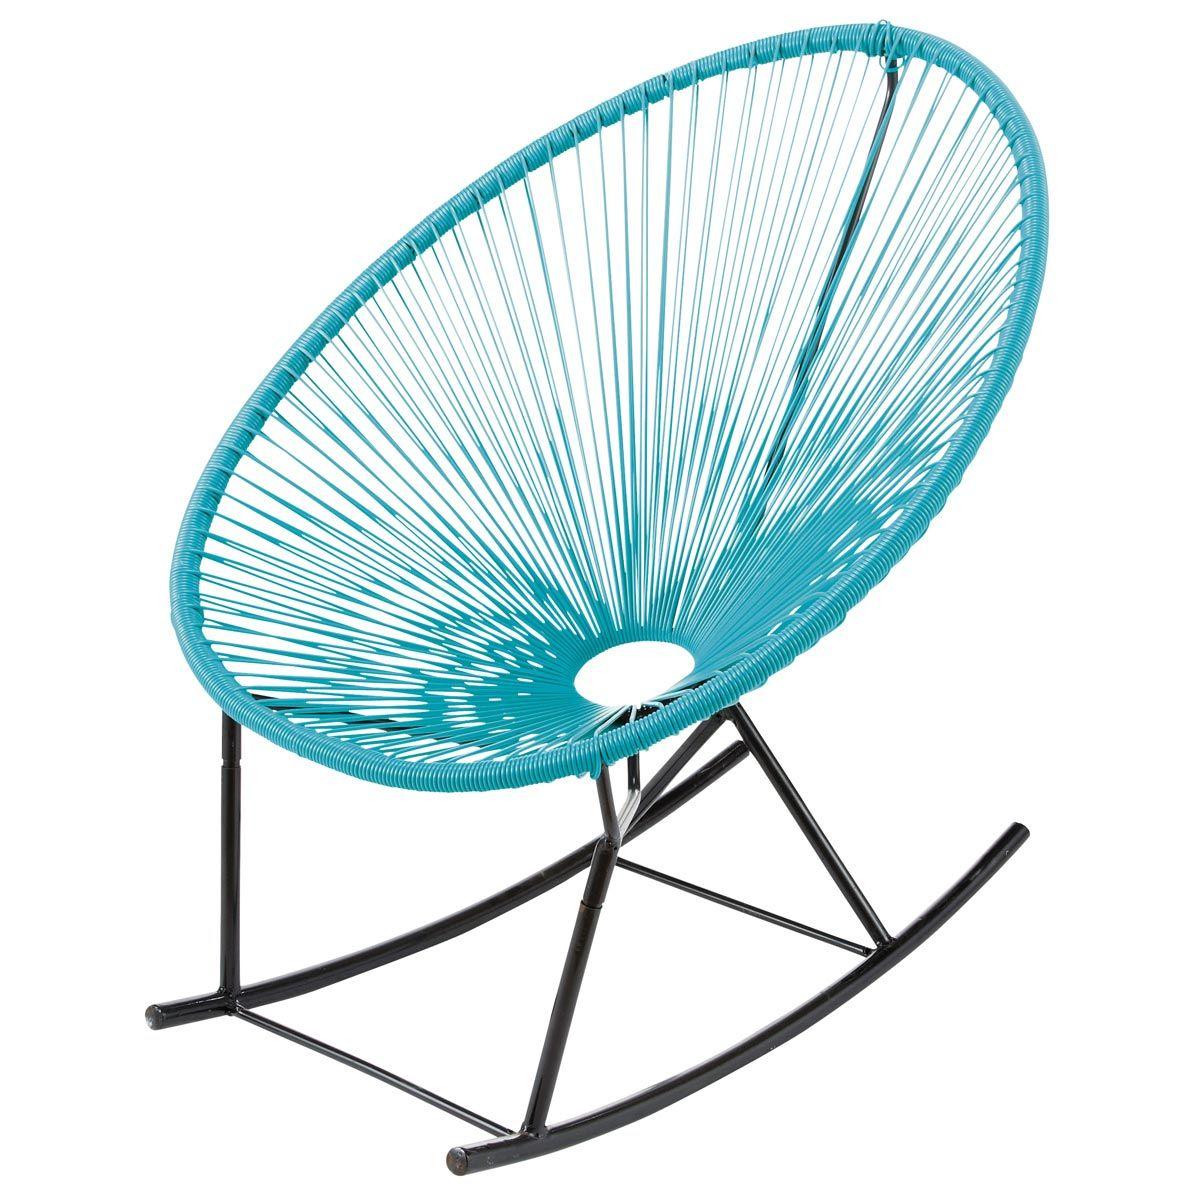 Garden Rocking Chair Turquoise Copacabana Maison Du Monde Garden Rocking Chair Rocking Chair Chair